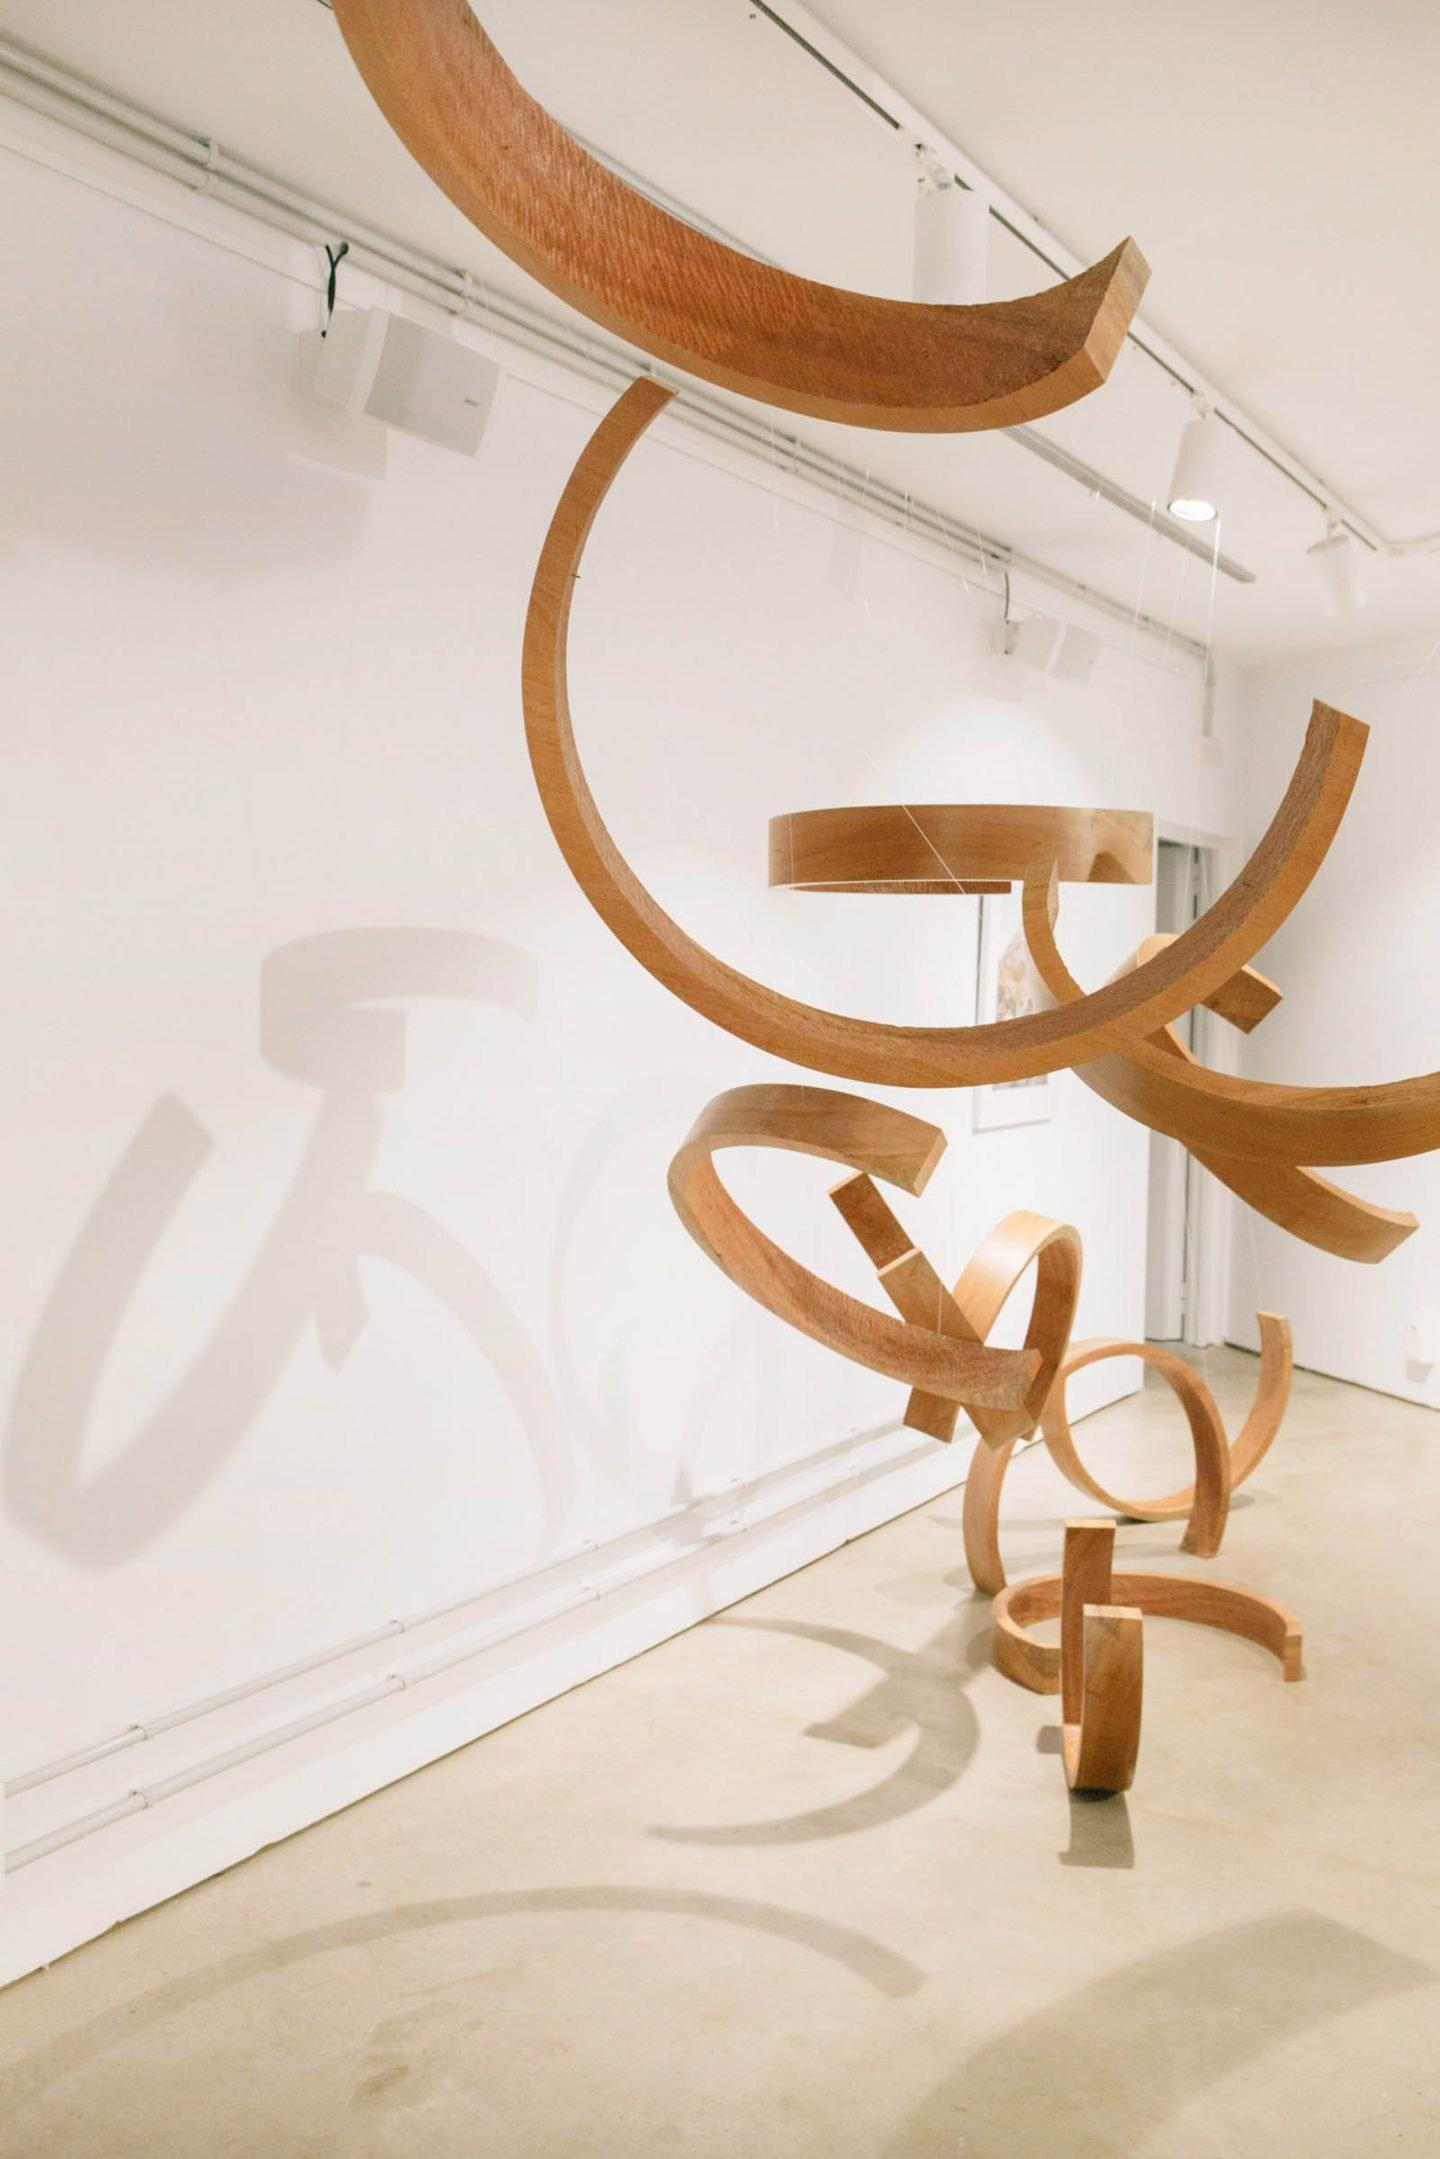 iGNANT-Art-Silvia-Conde-Cyclus-015